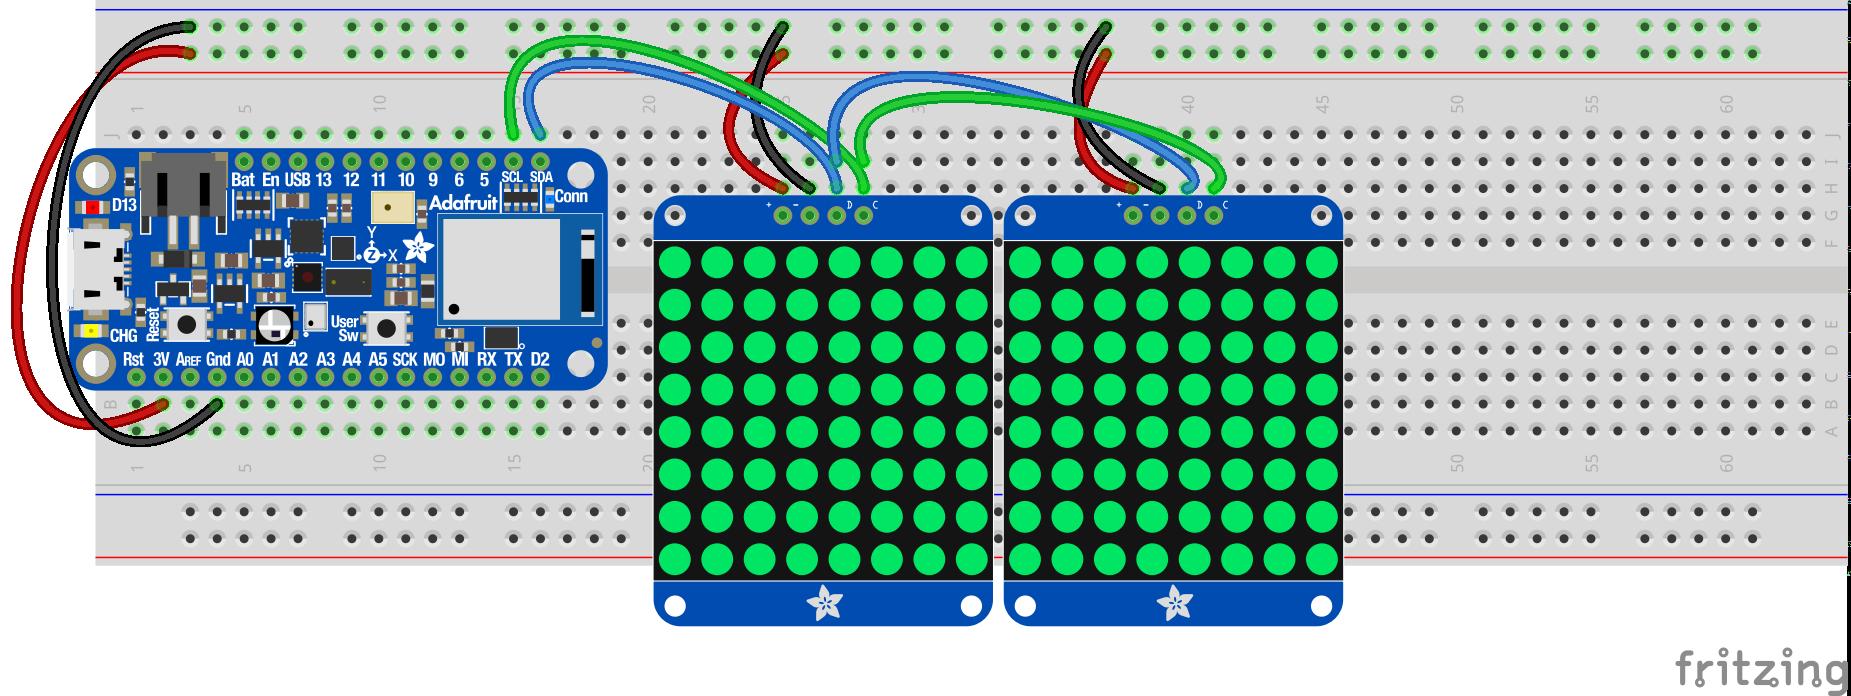 led_matrices_double_matrix_bb.png